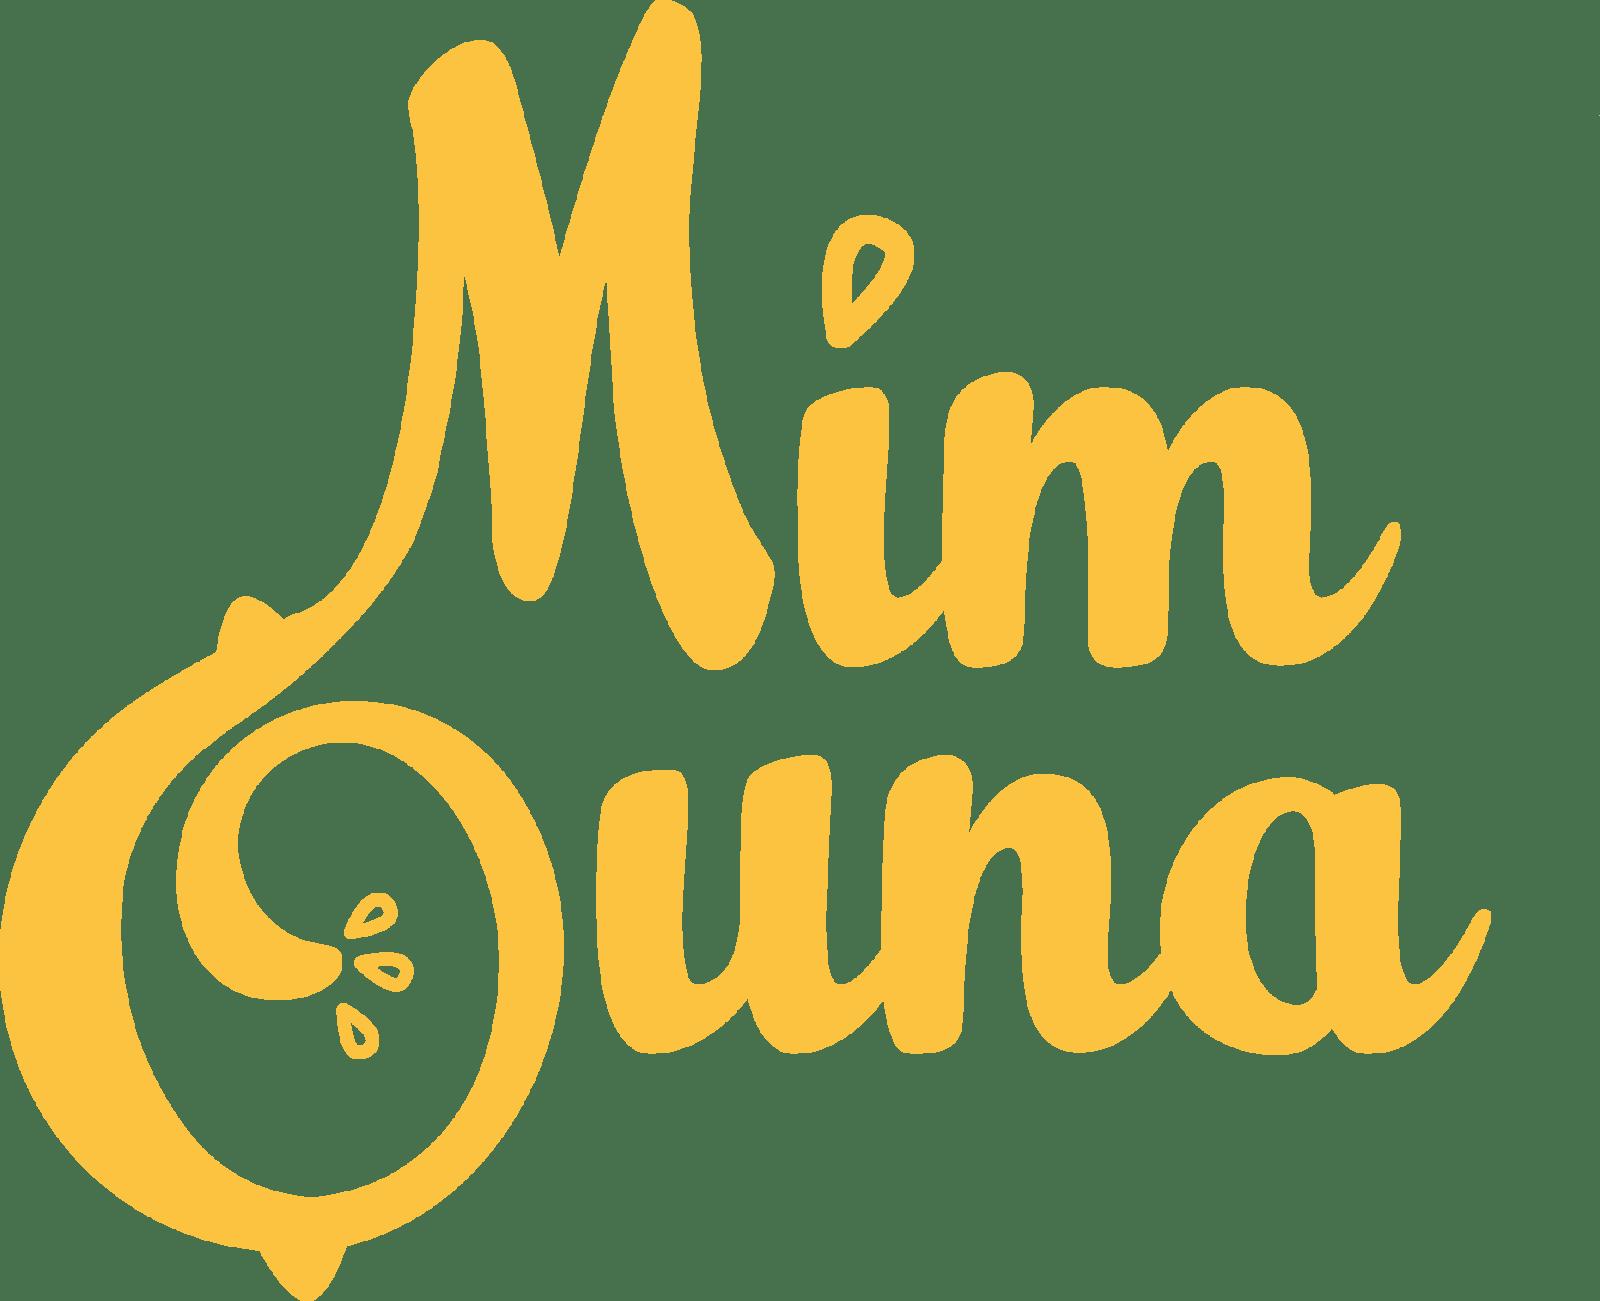 Citronnade Mimouna